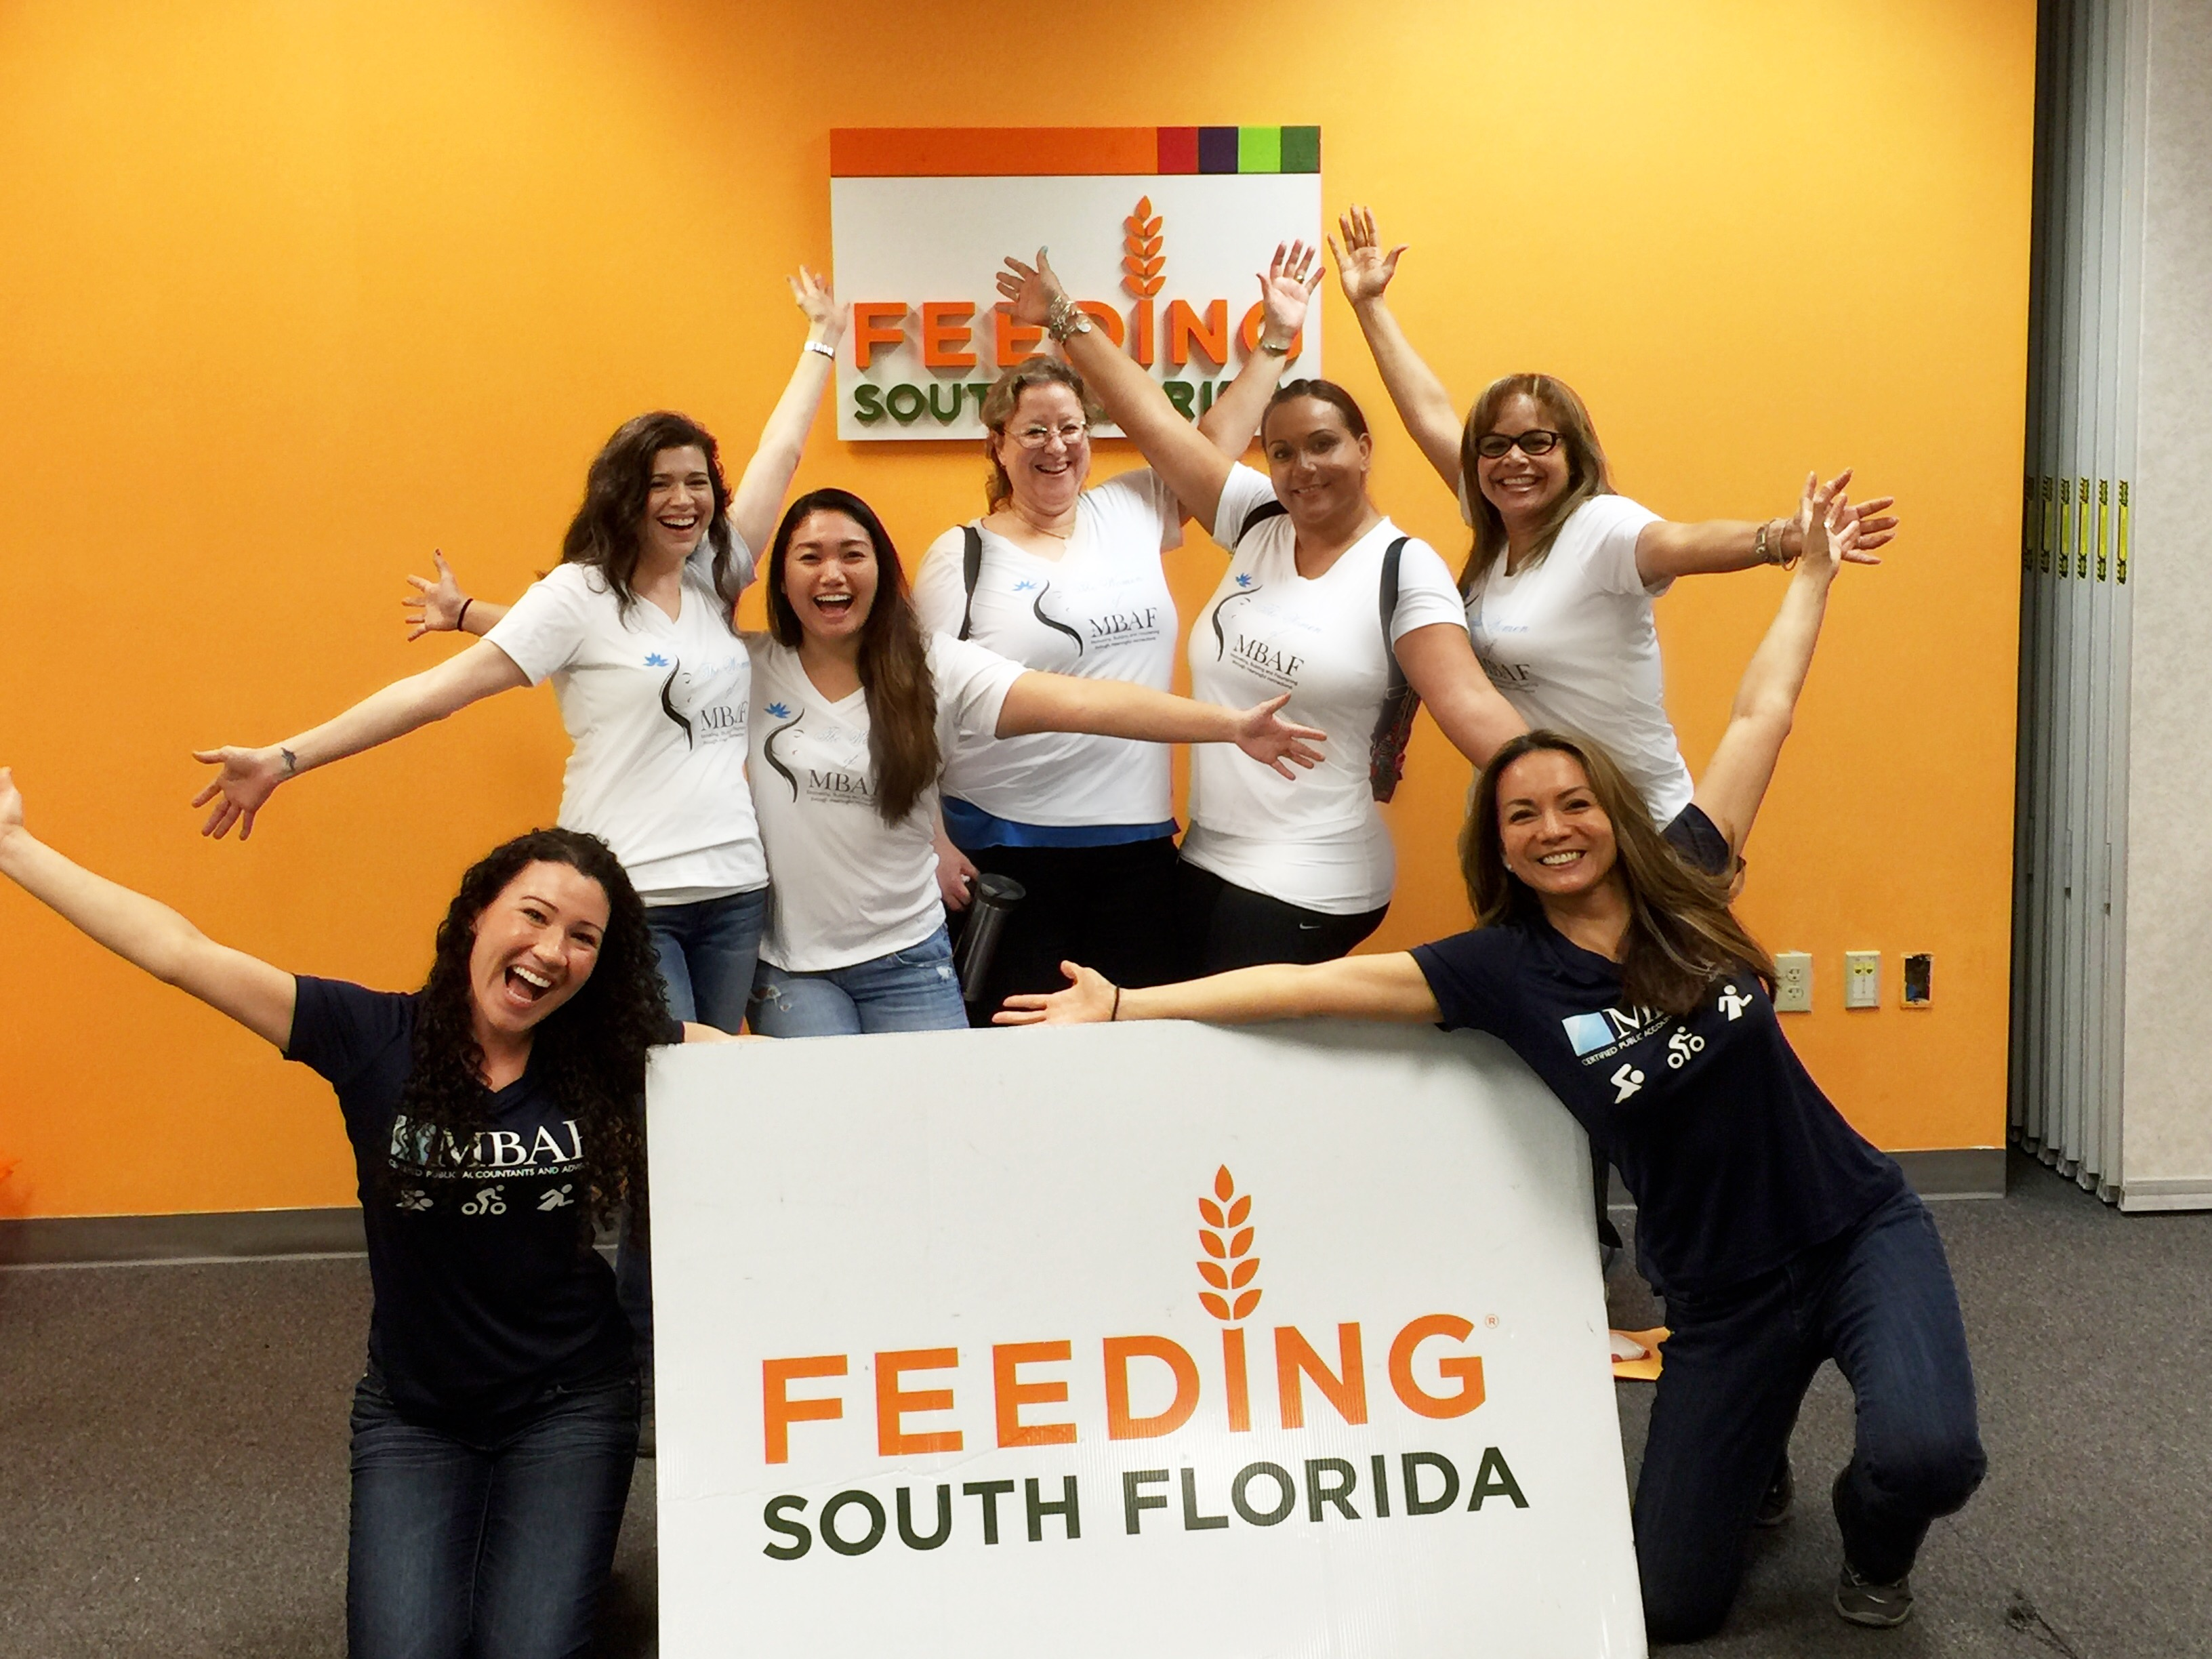 The team volunteering at Feeding South Florida!